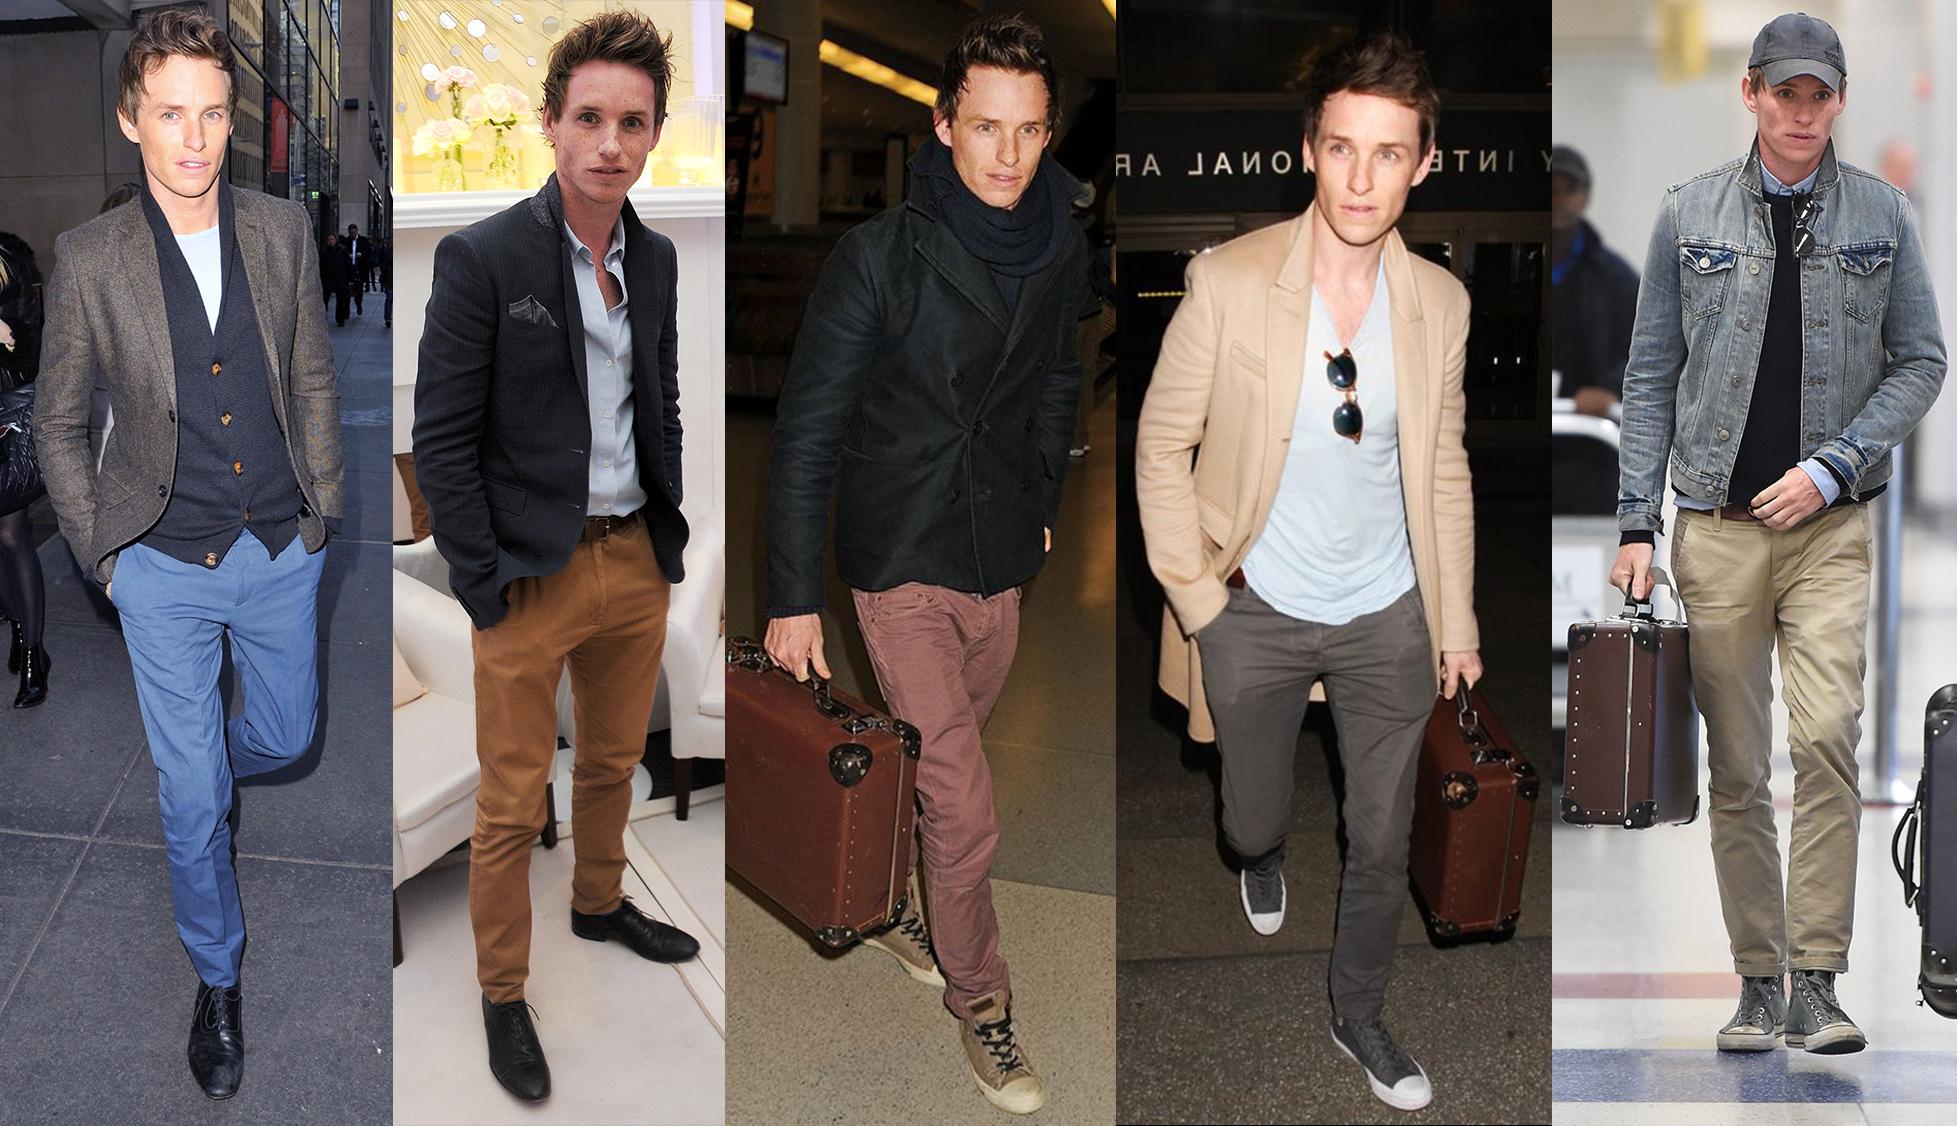 eddie_radmeyne_style_men_top10_fashion